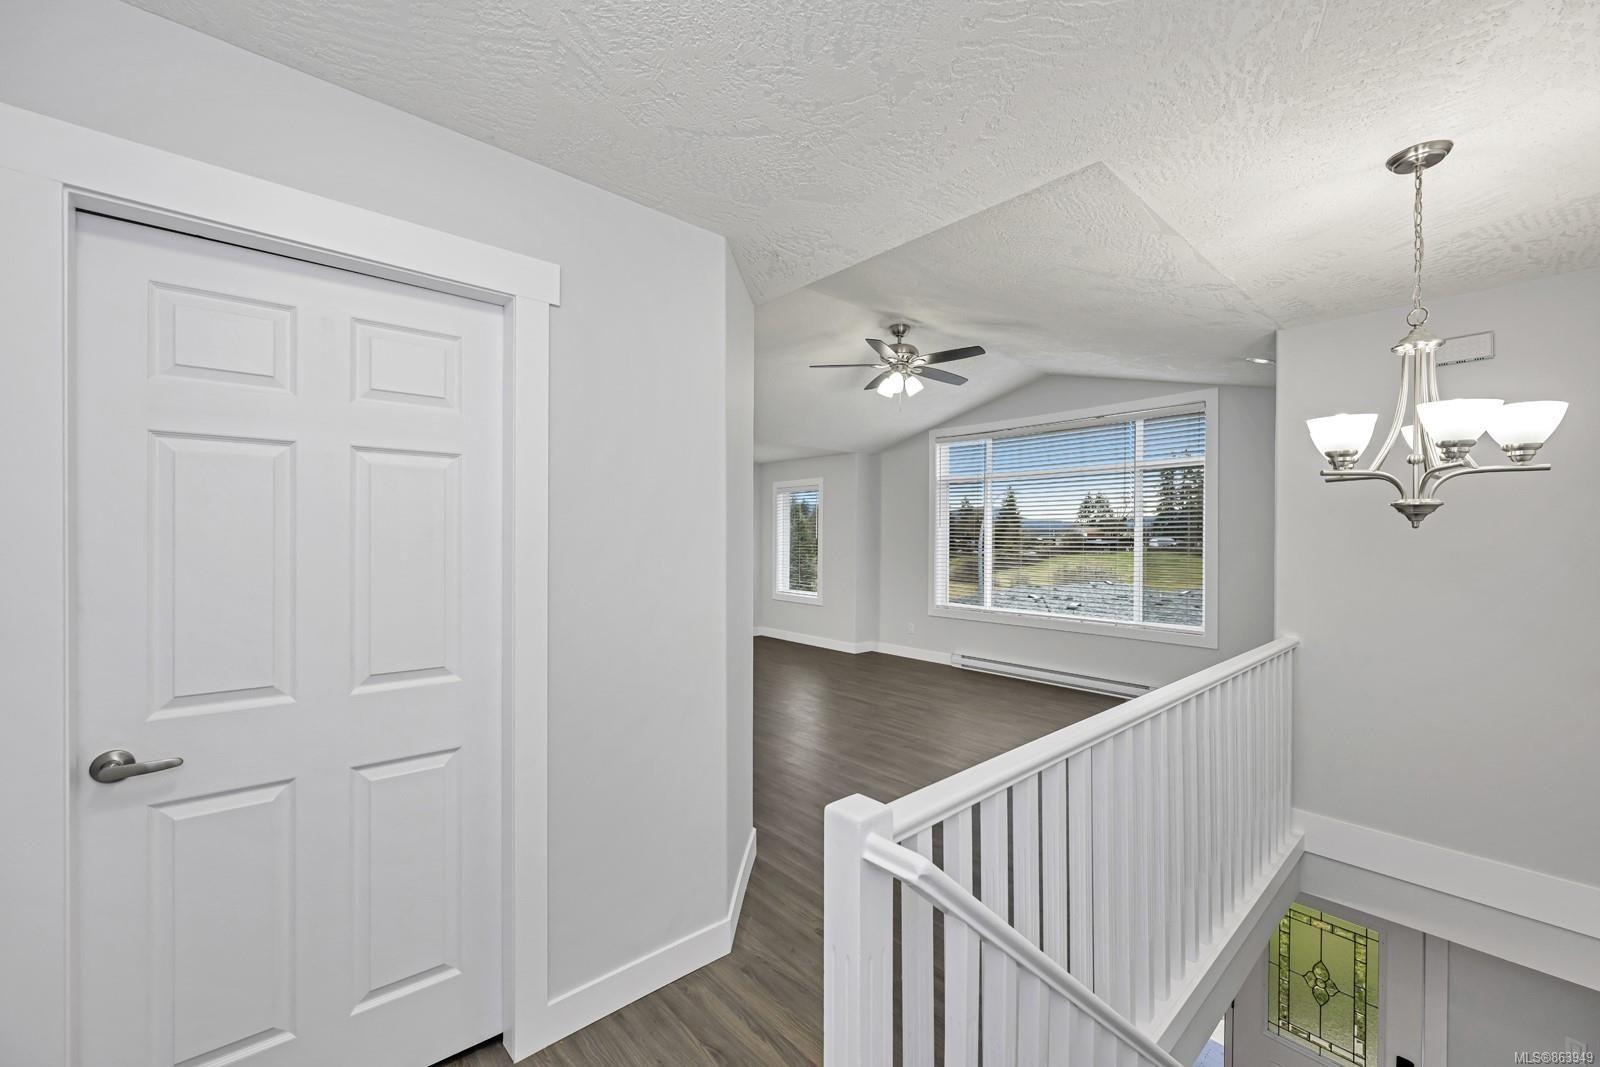 Photo 13: Photos: 6154 Sayward Rd in : Du West Duncan Half Duplex for sale (Duncan)  : MLS®# 863949